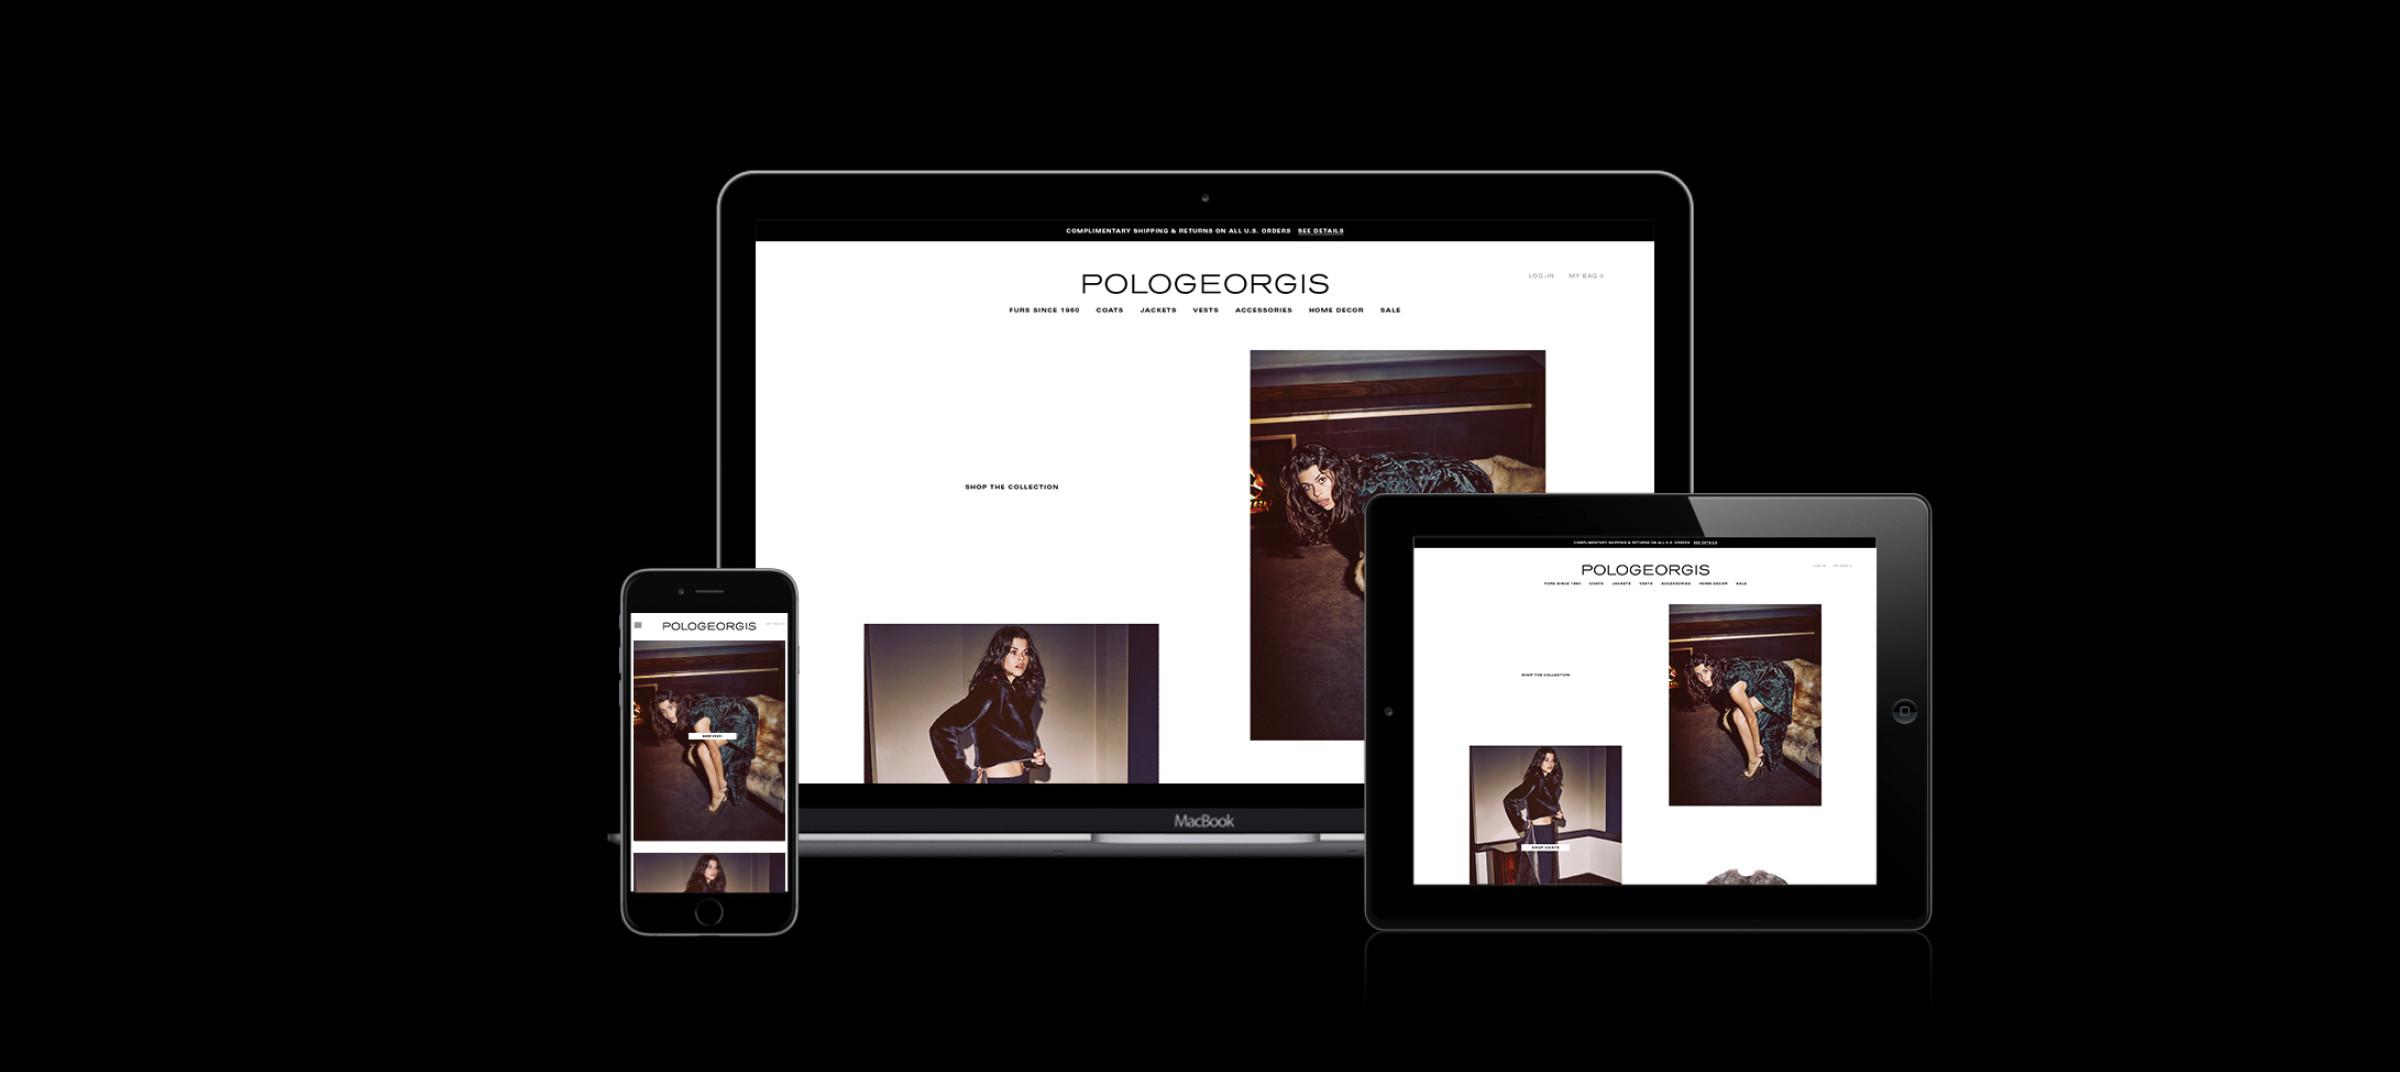 E-commerce launch for Pologeorgis by DTE Studio